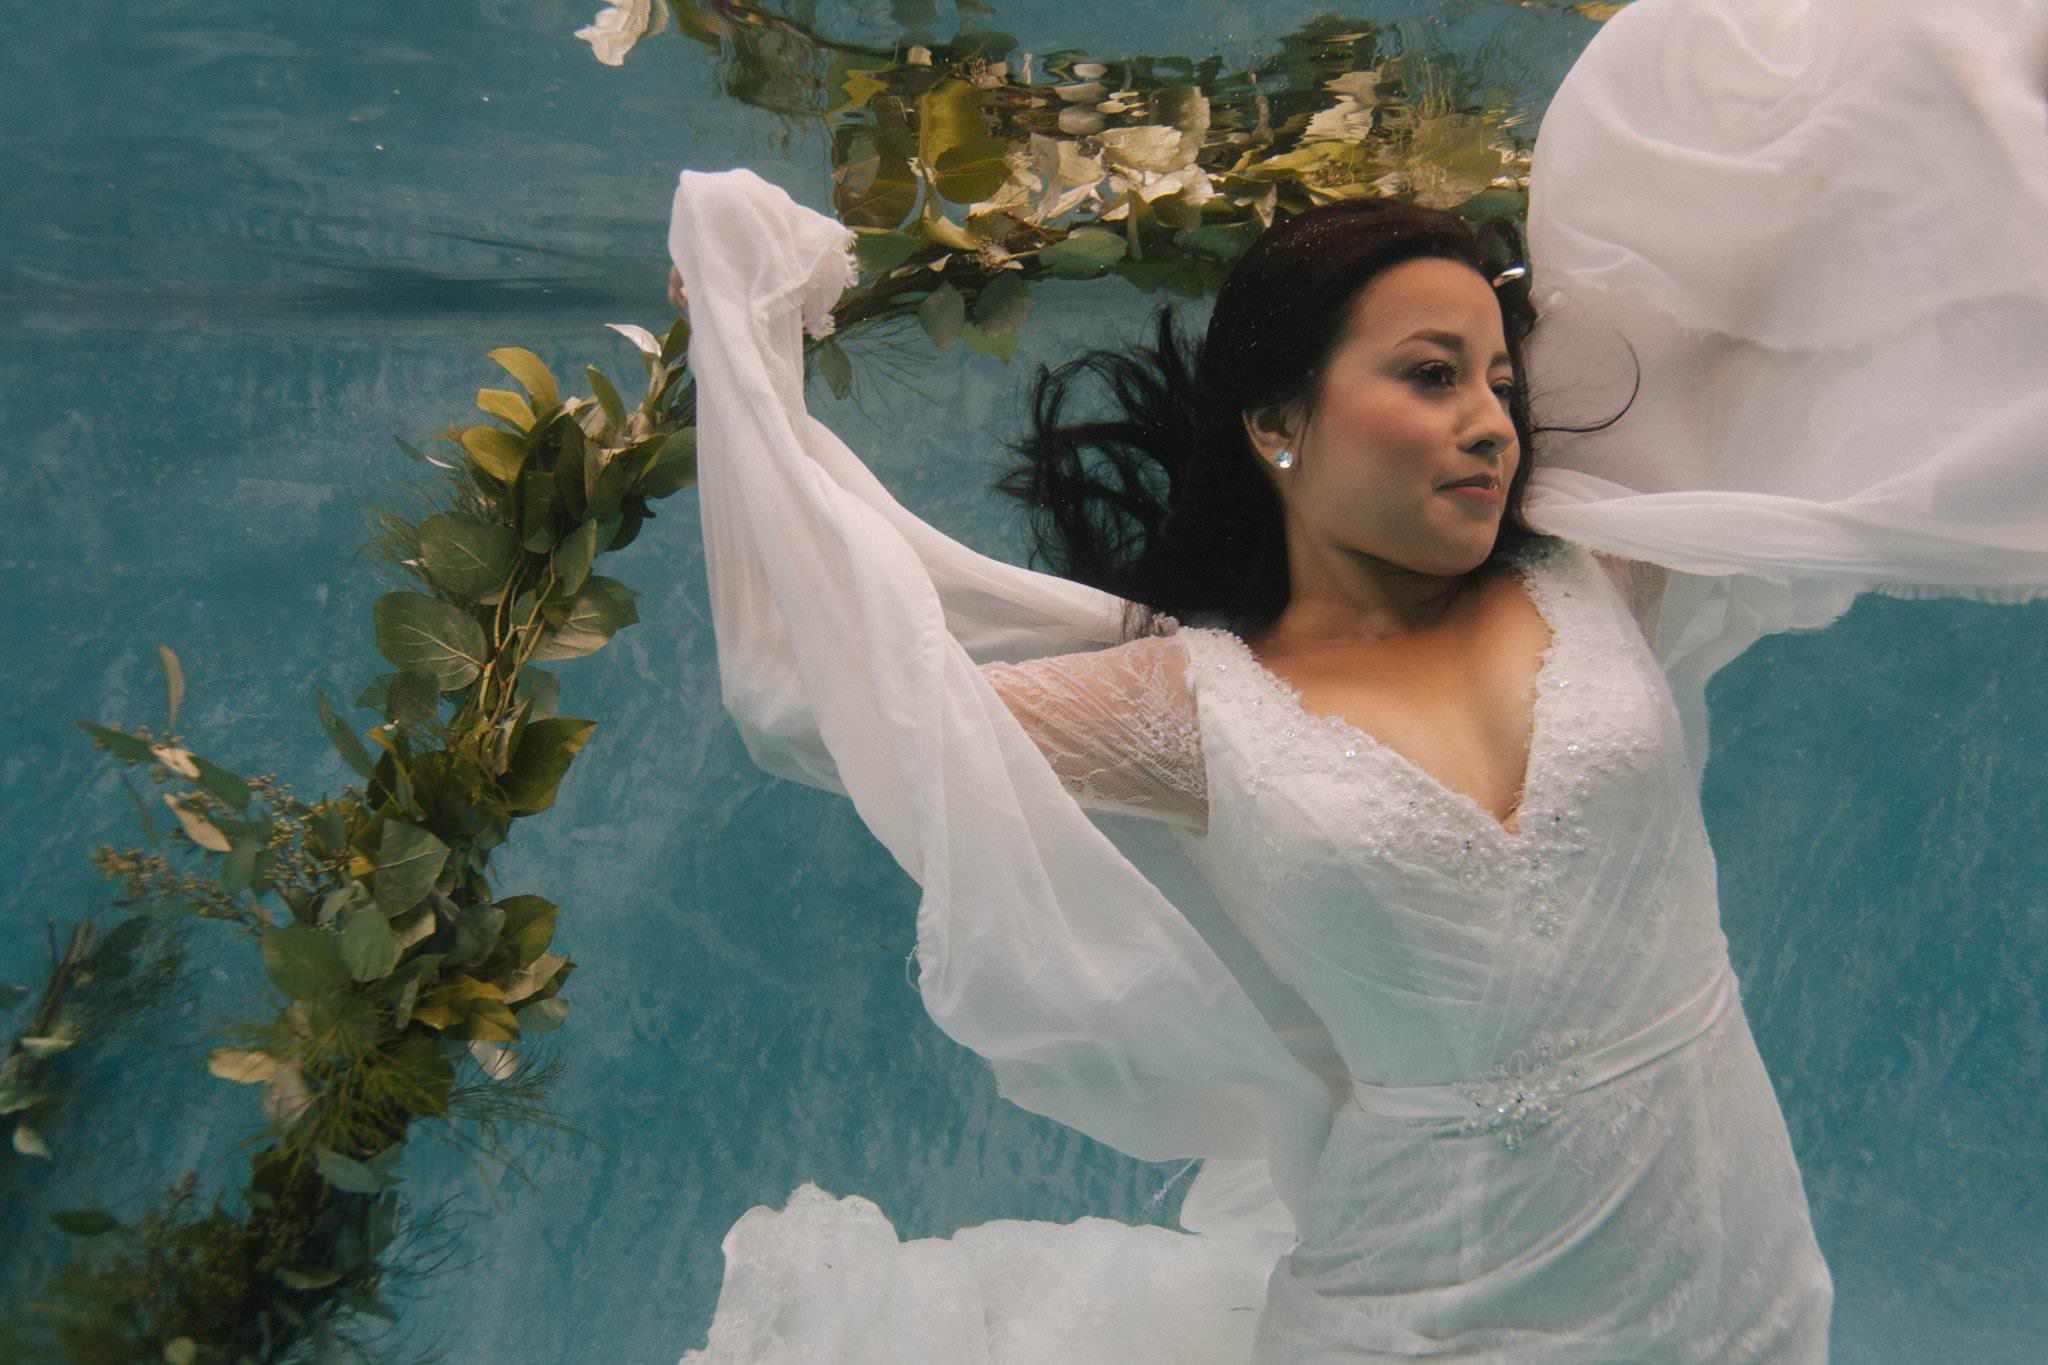 Arizona underwater wedding photographer